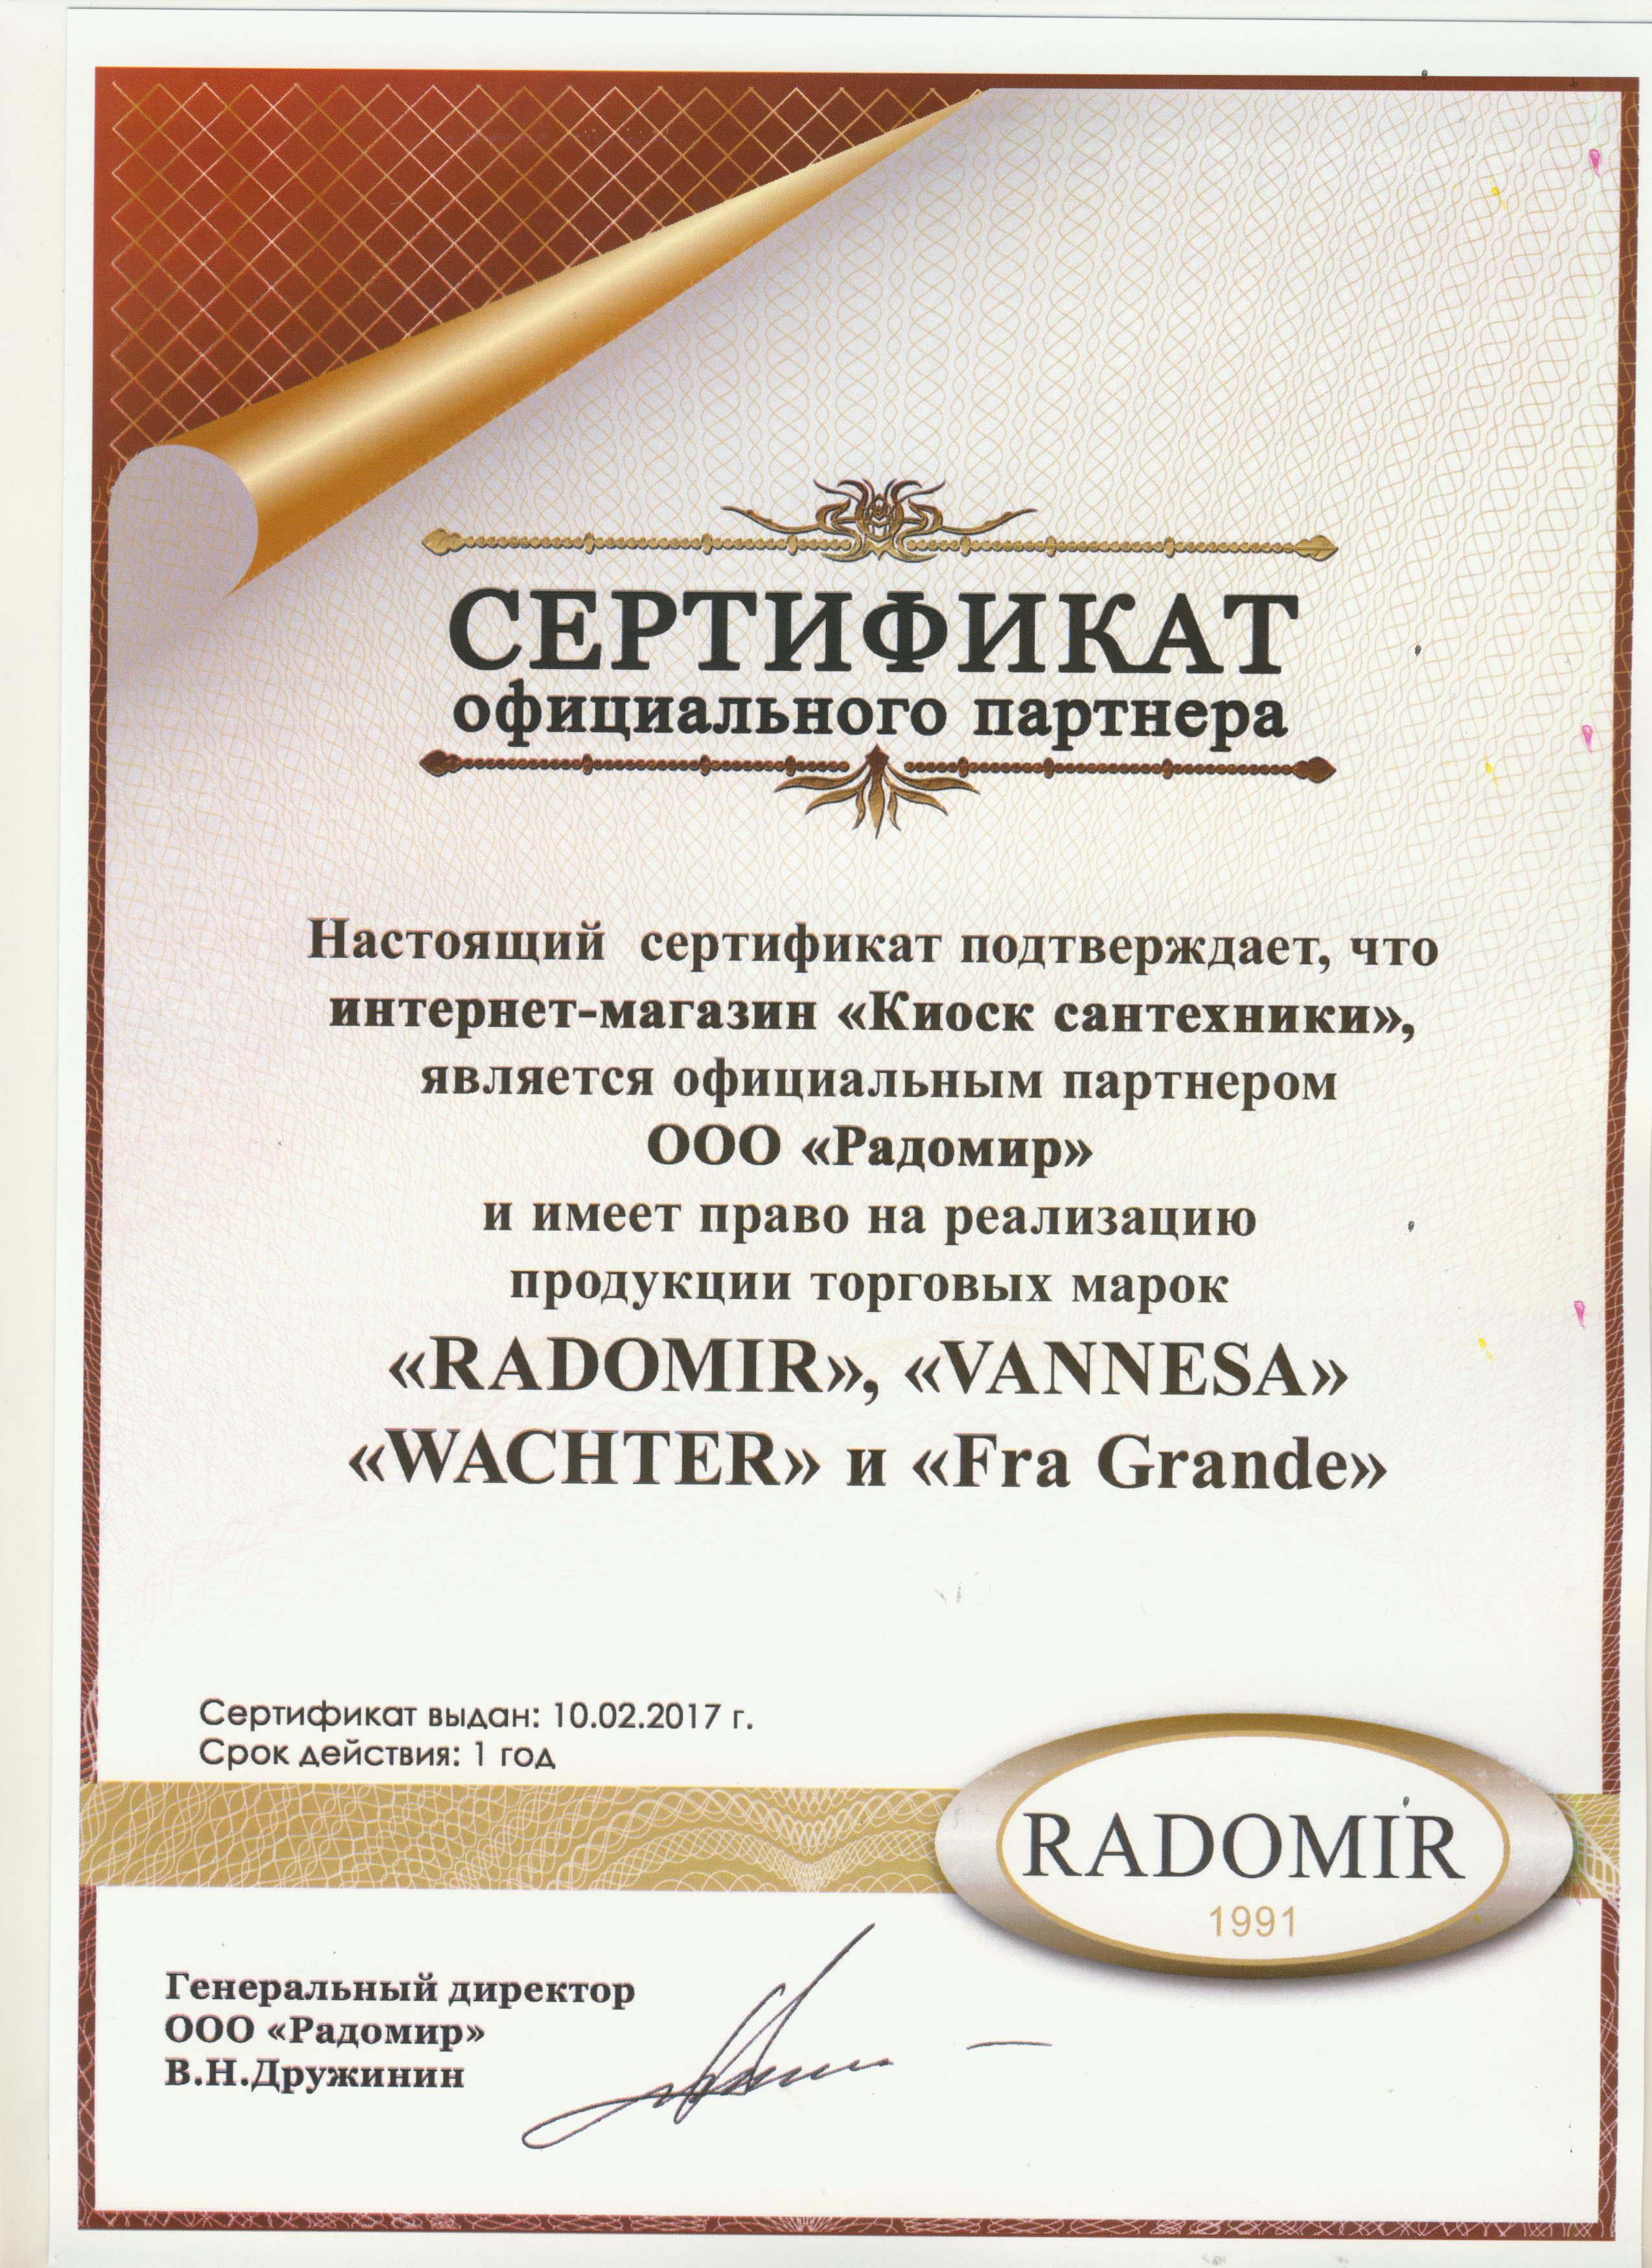 Фото 1057: Гидромассажная ванна серия Радомир (Radomir) ПАРМА GOLD серия Standard